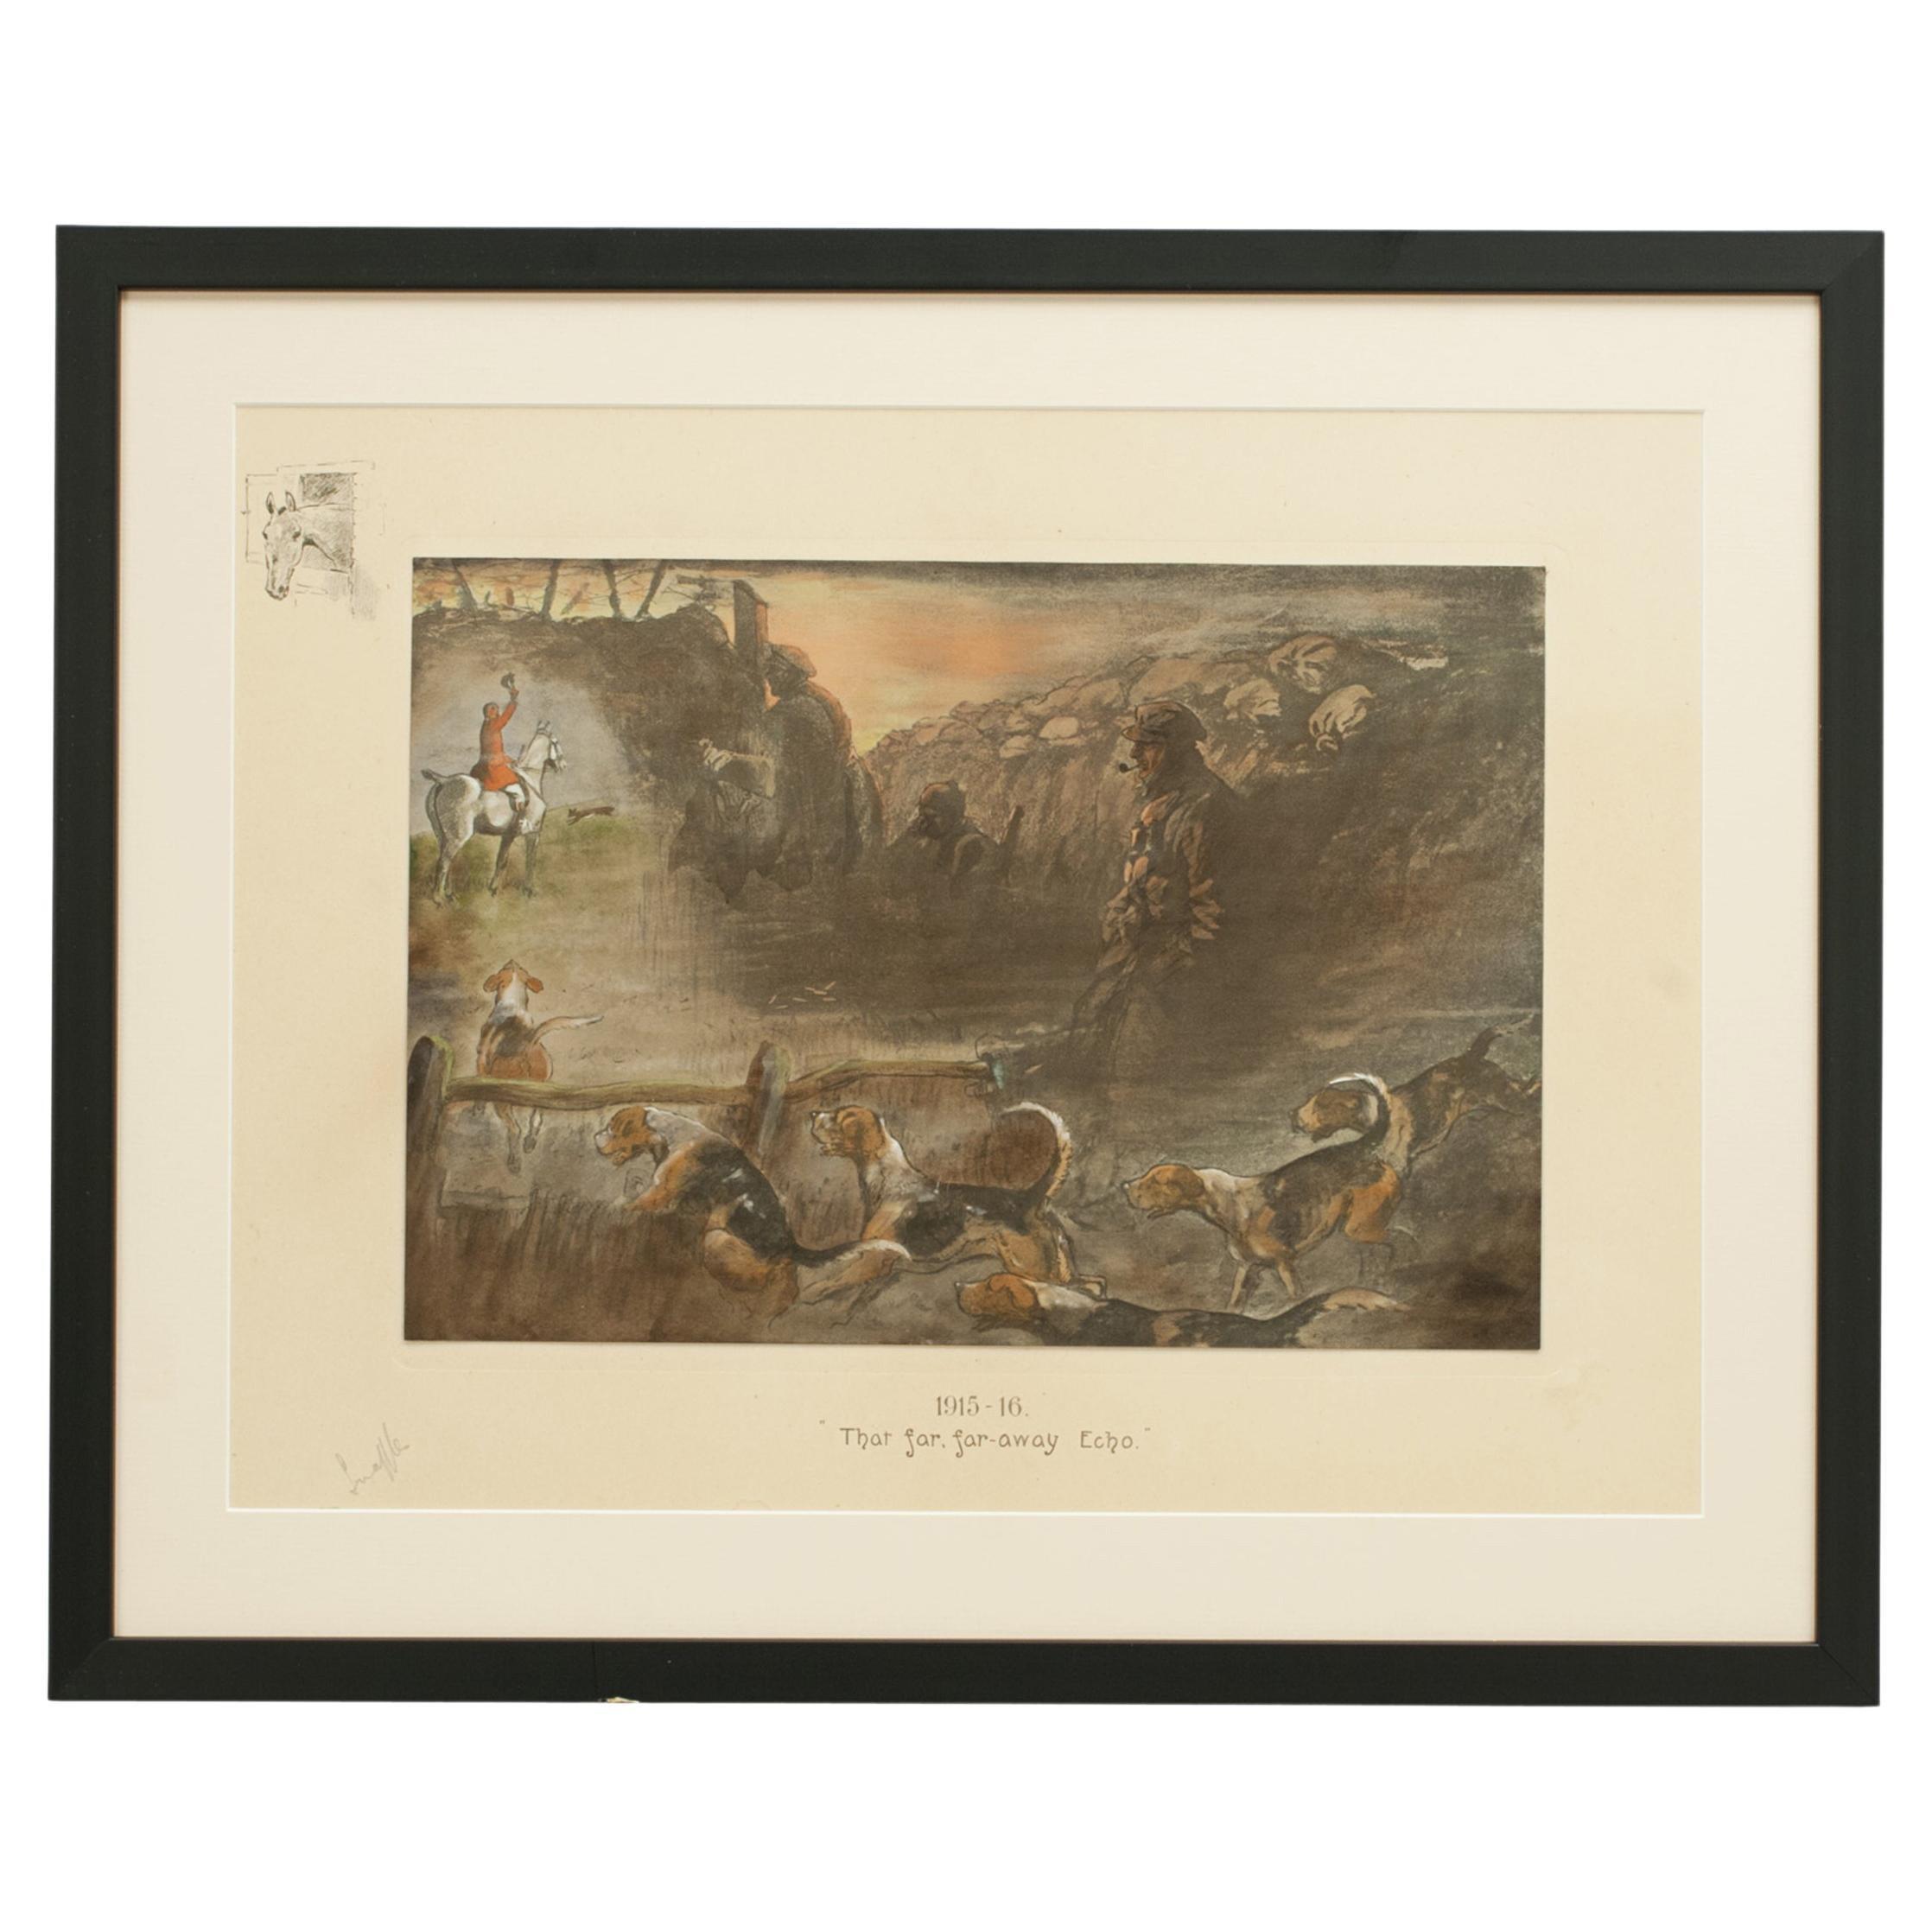 Signed WWI Military Print, That Far, Far-away Echo by Snaffles